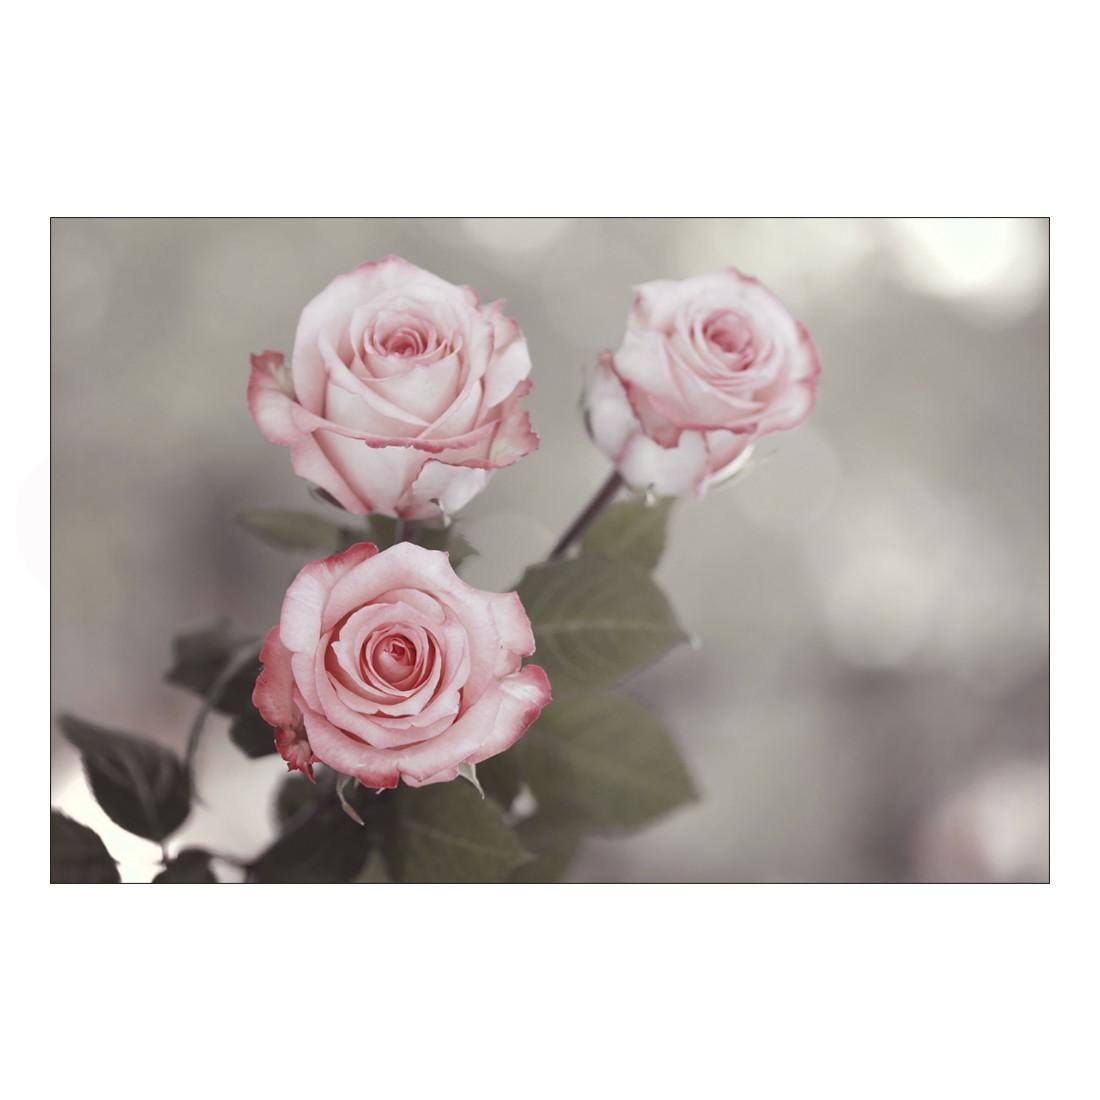 Acrylglasbild Three Roses – Abmessung 30×20 cm, Gallery of Innovative Art jetzt kaufen